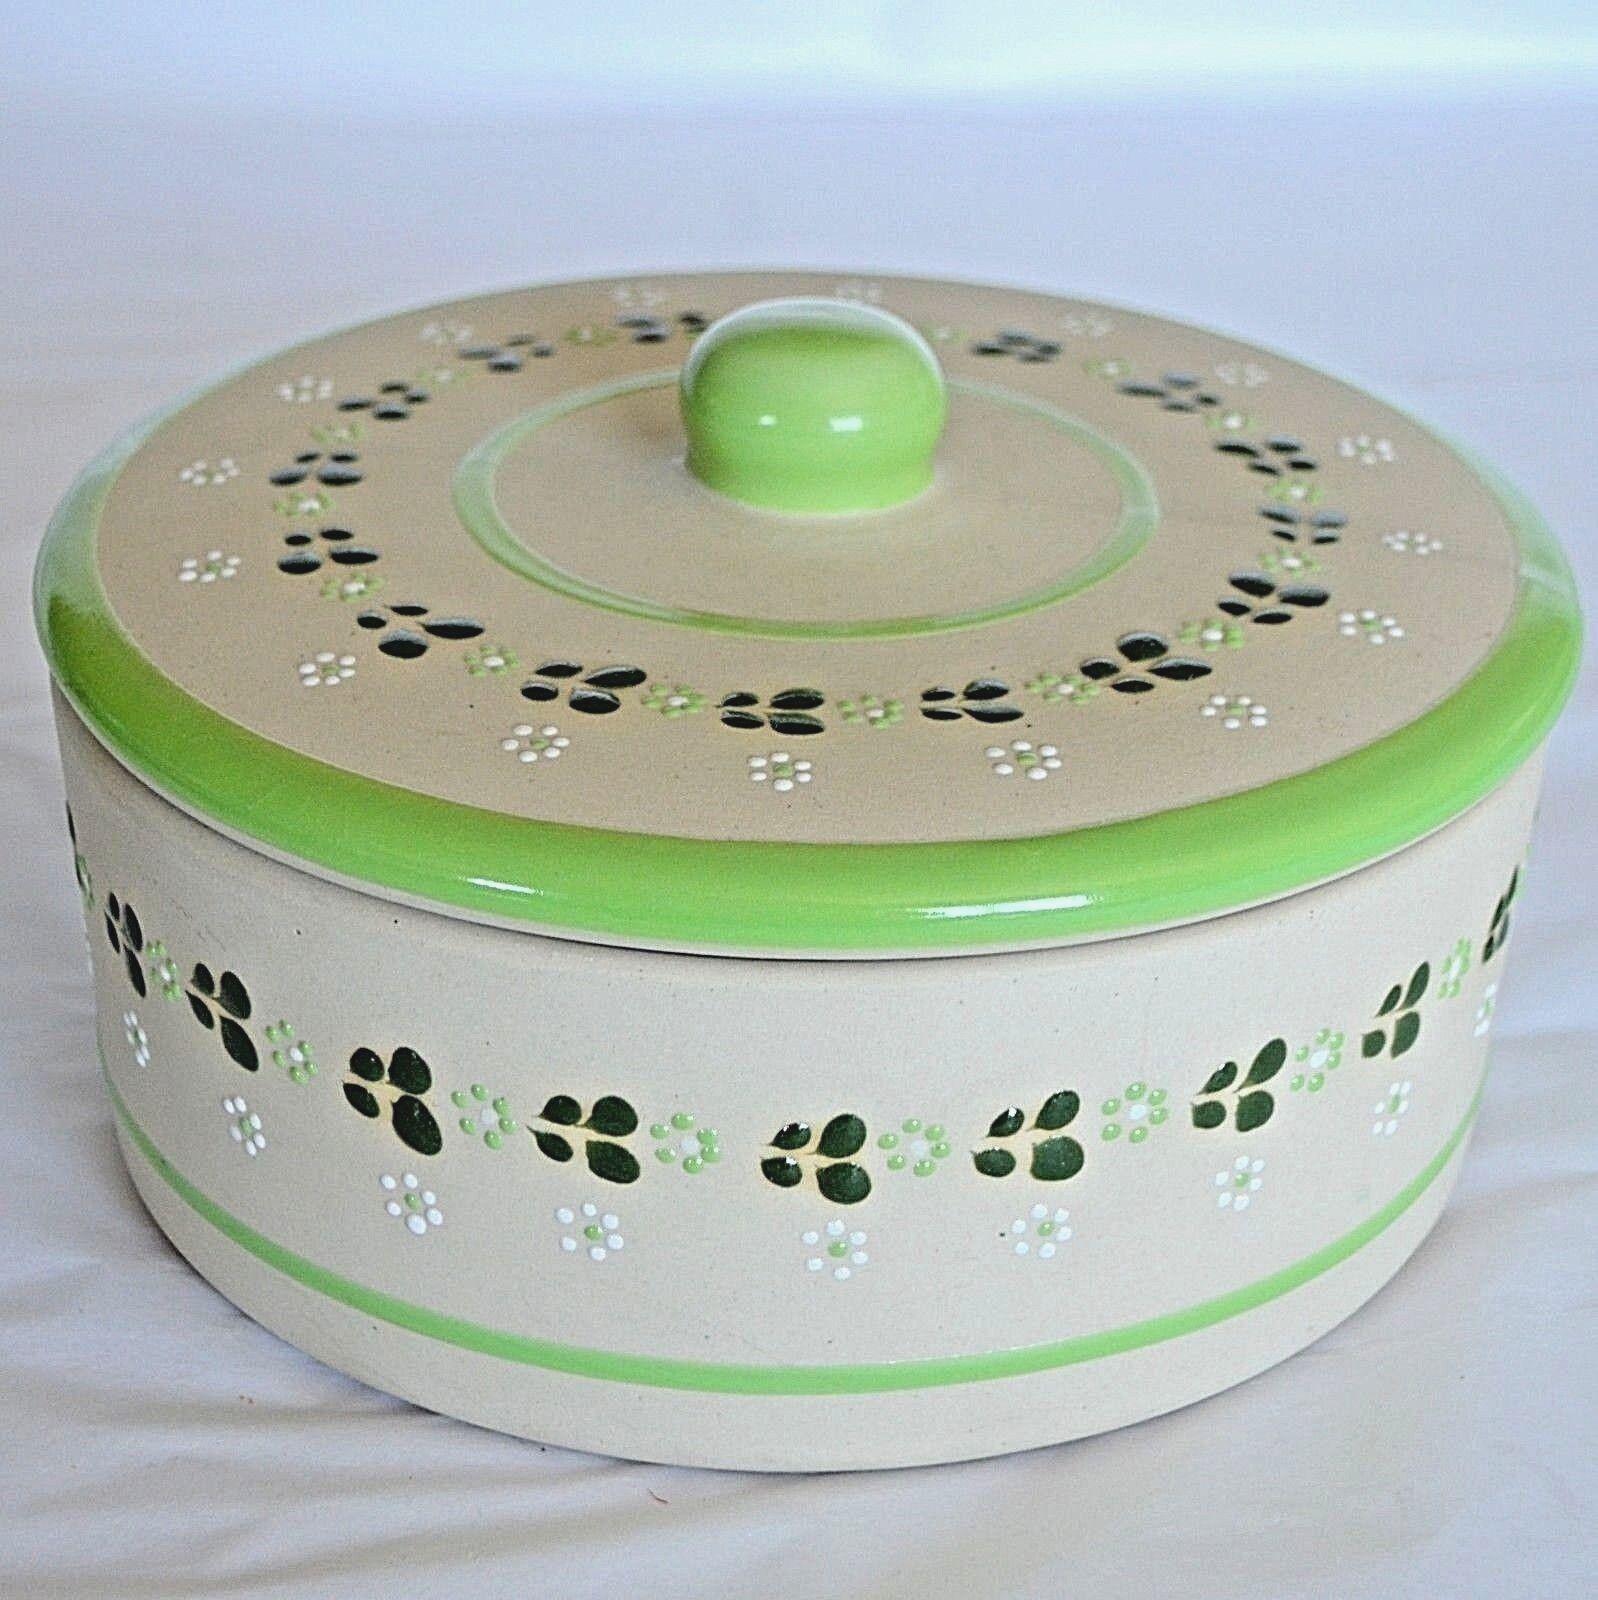 MEXICAIN POTERIE Tortilla Warmer Ceramic Serving Dish & Couvercle Pot Bol Vert Floral